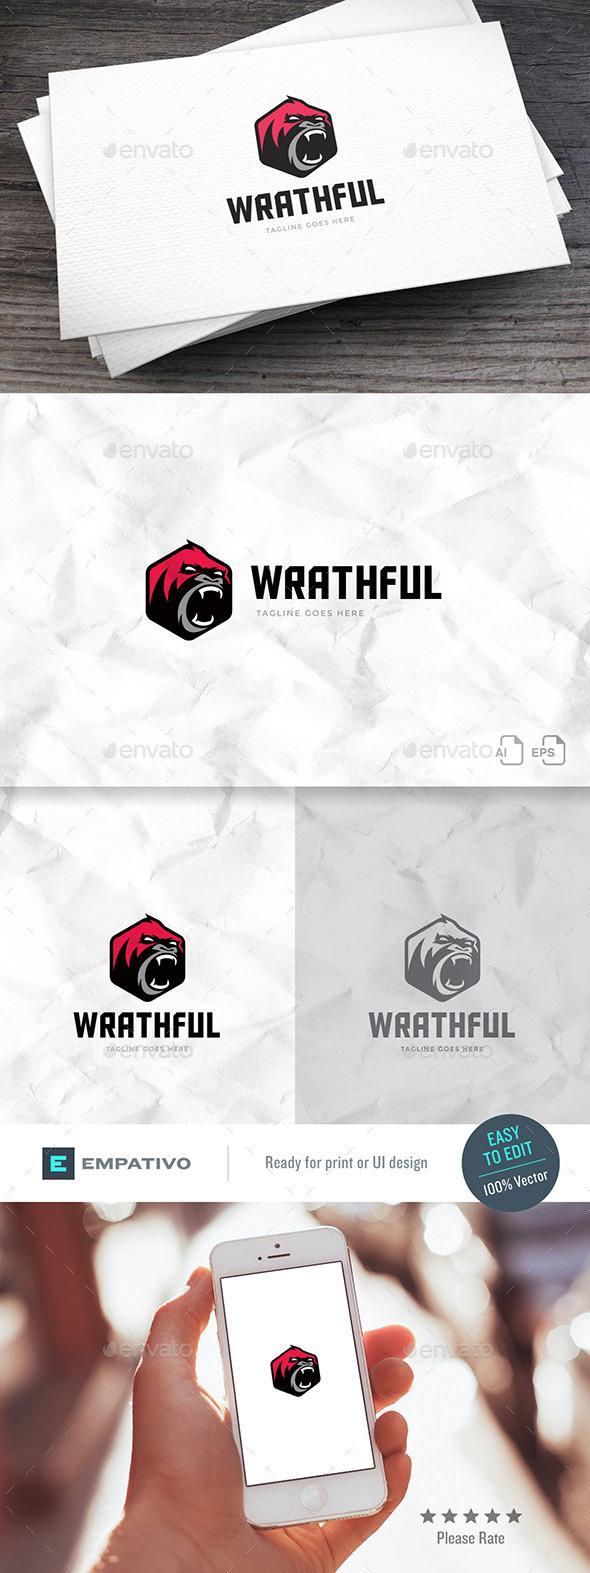 Wrathful Logo Template - Animals Logo Templates